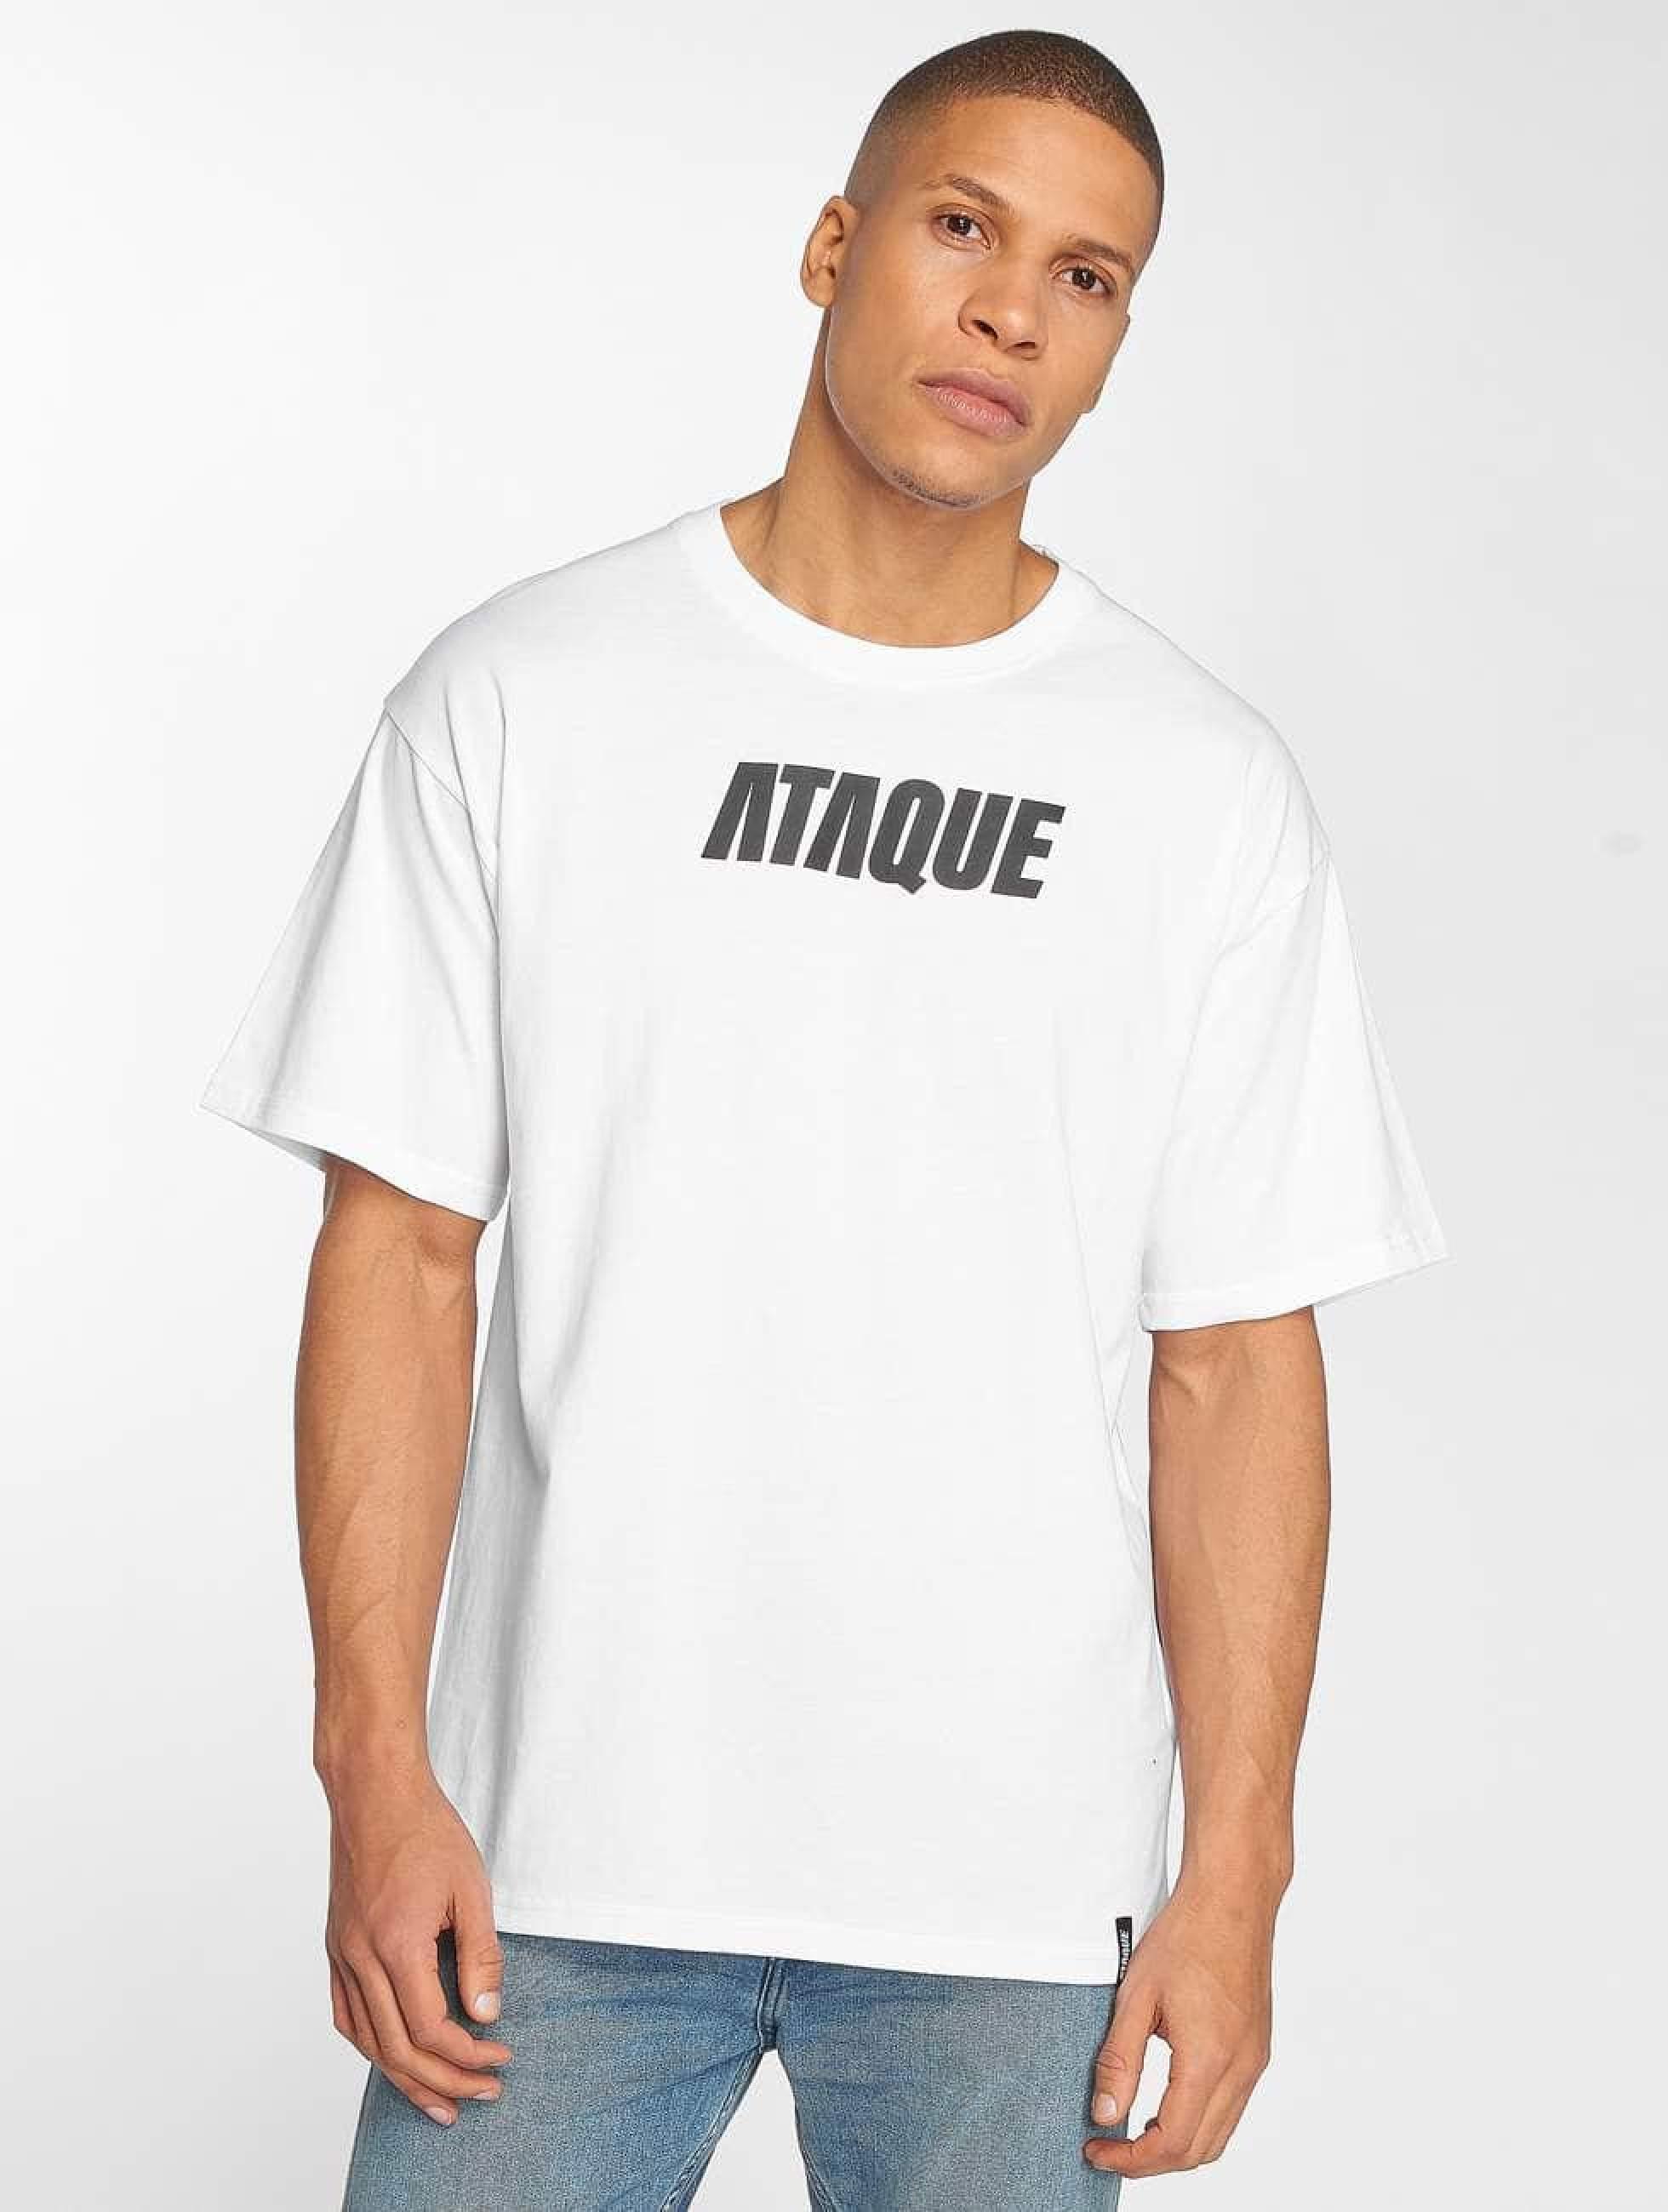 Ataque / T-Shirt Leon in white XL